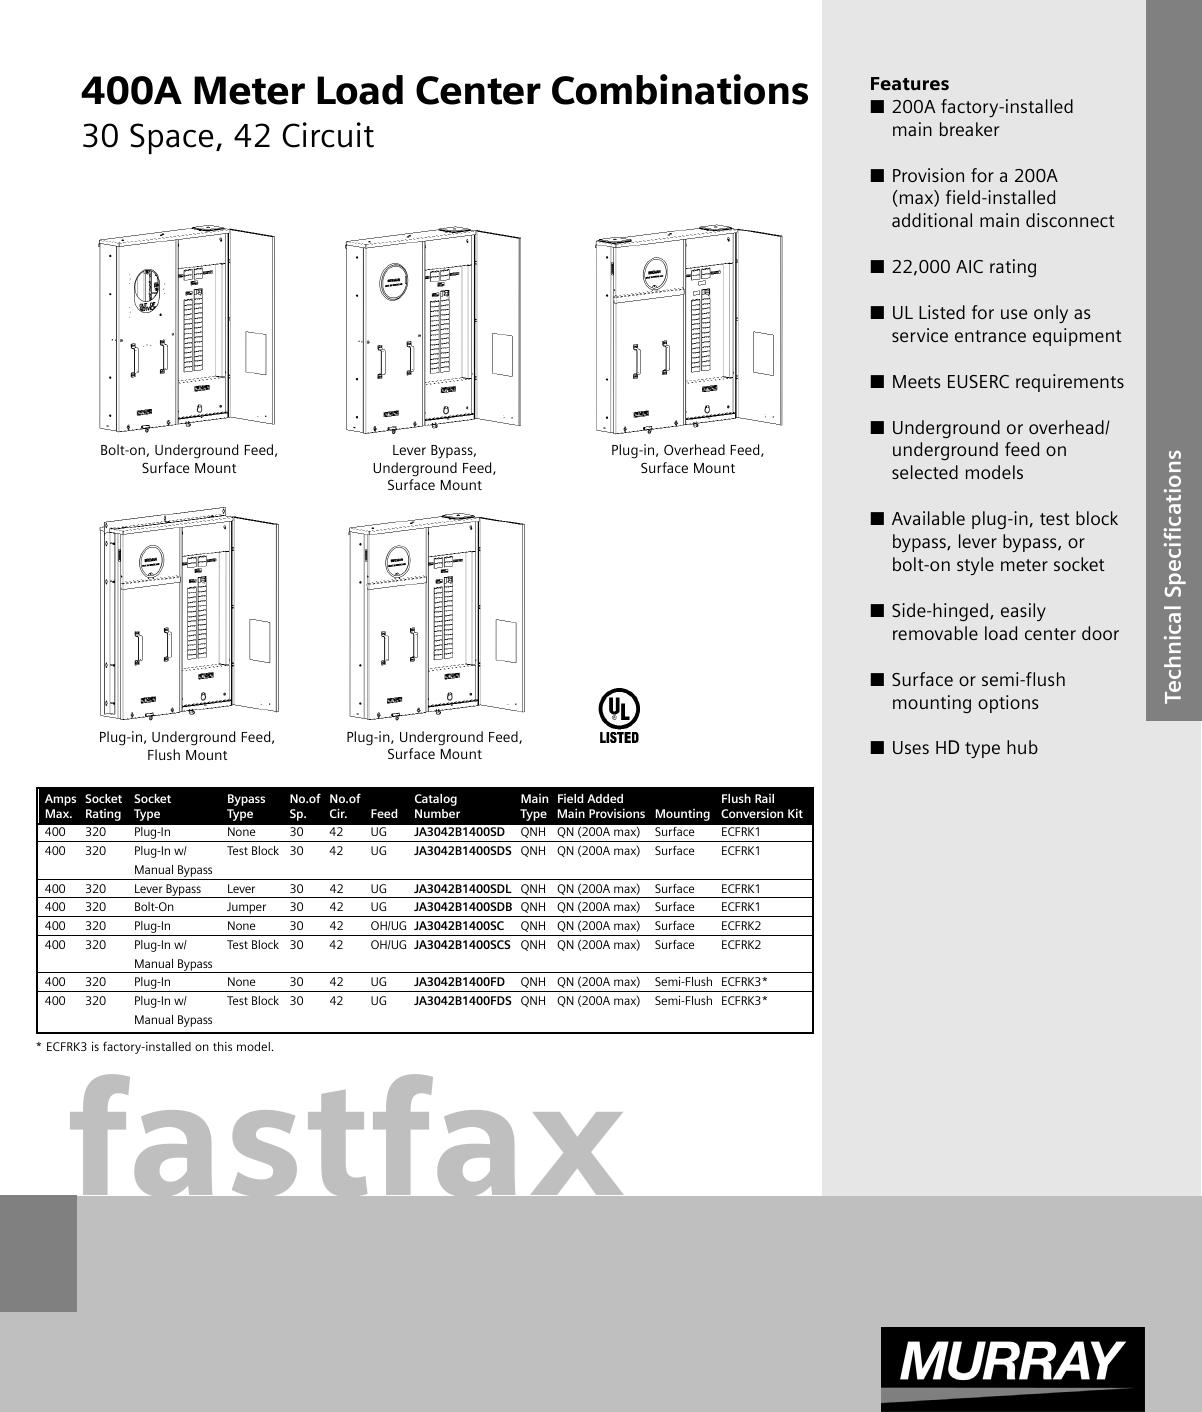 Murray30Space42Circuit Brochure